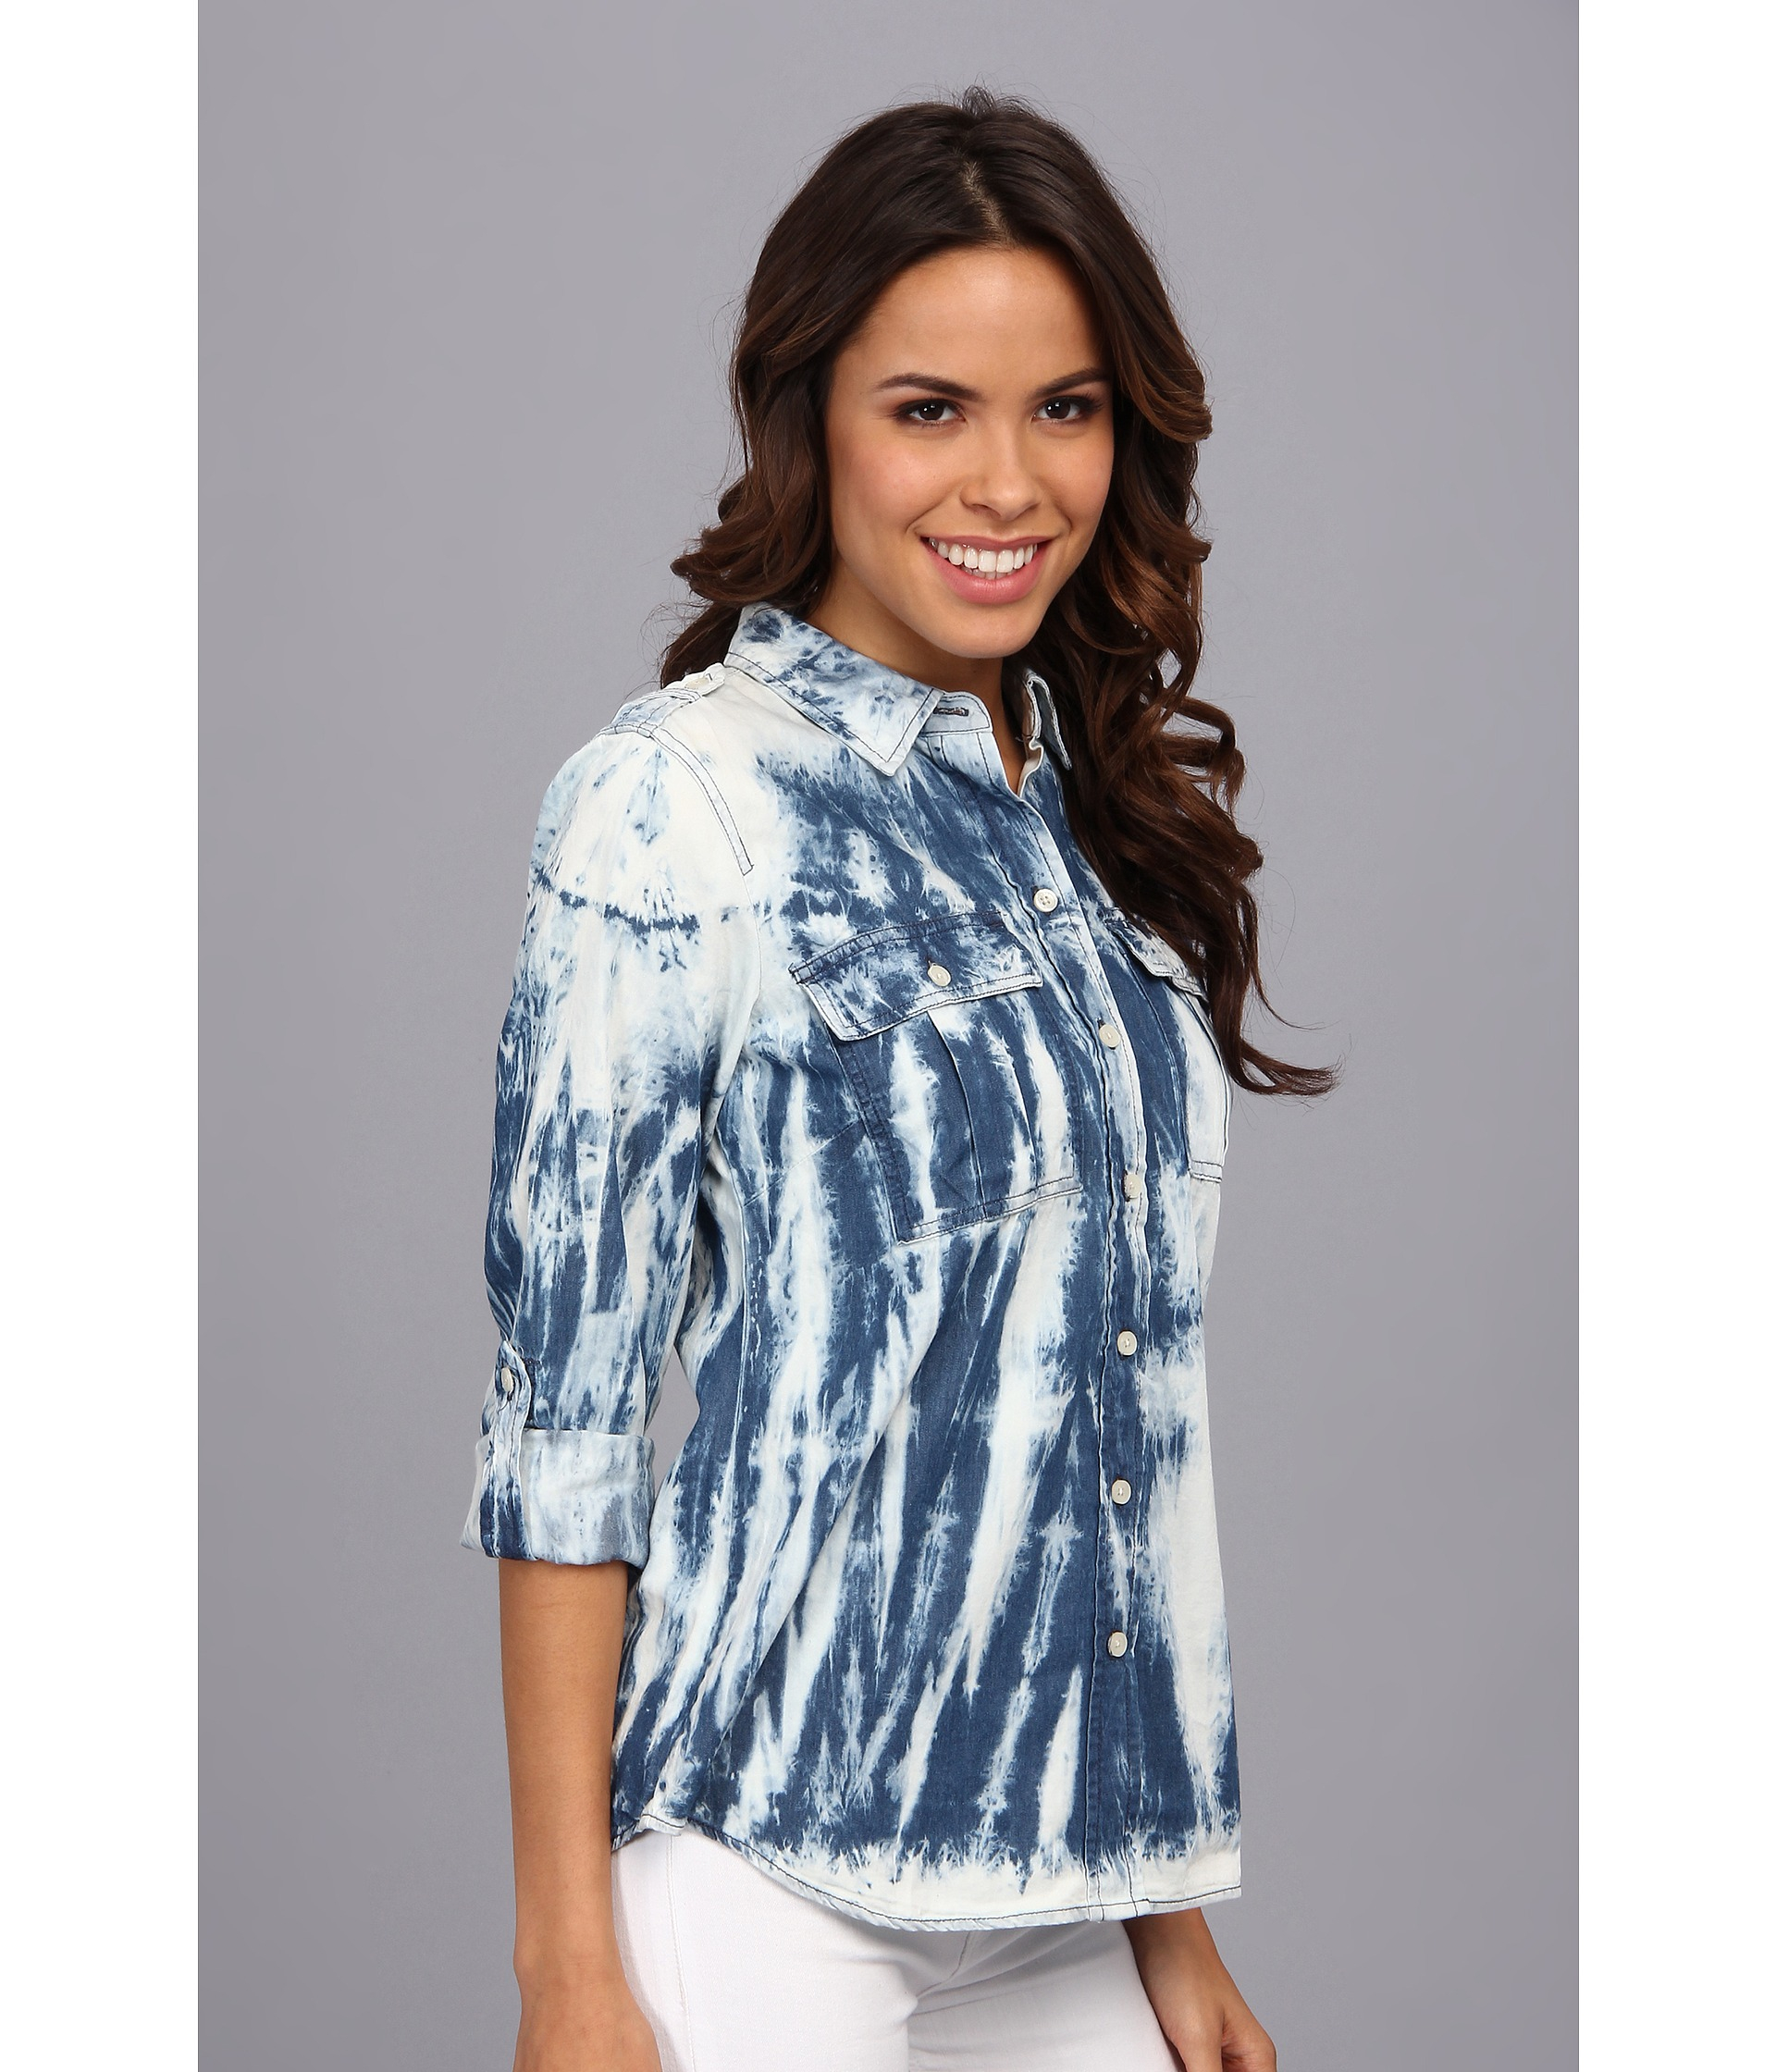 138c0c6d47f Lyst - MICHAEL Michael Kors Vintage Tie Dye Denim Shirt in Blue